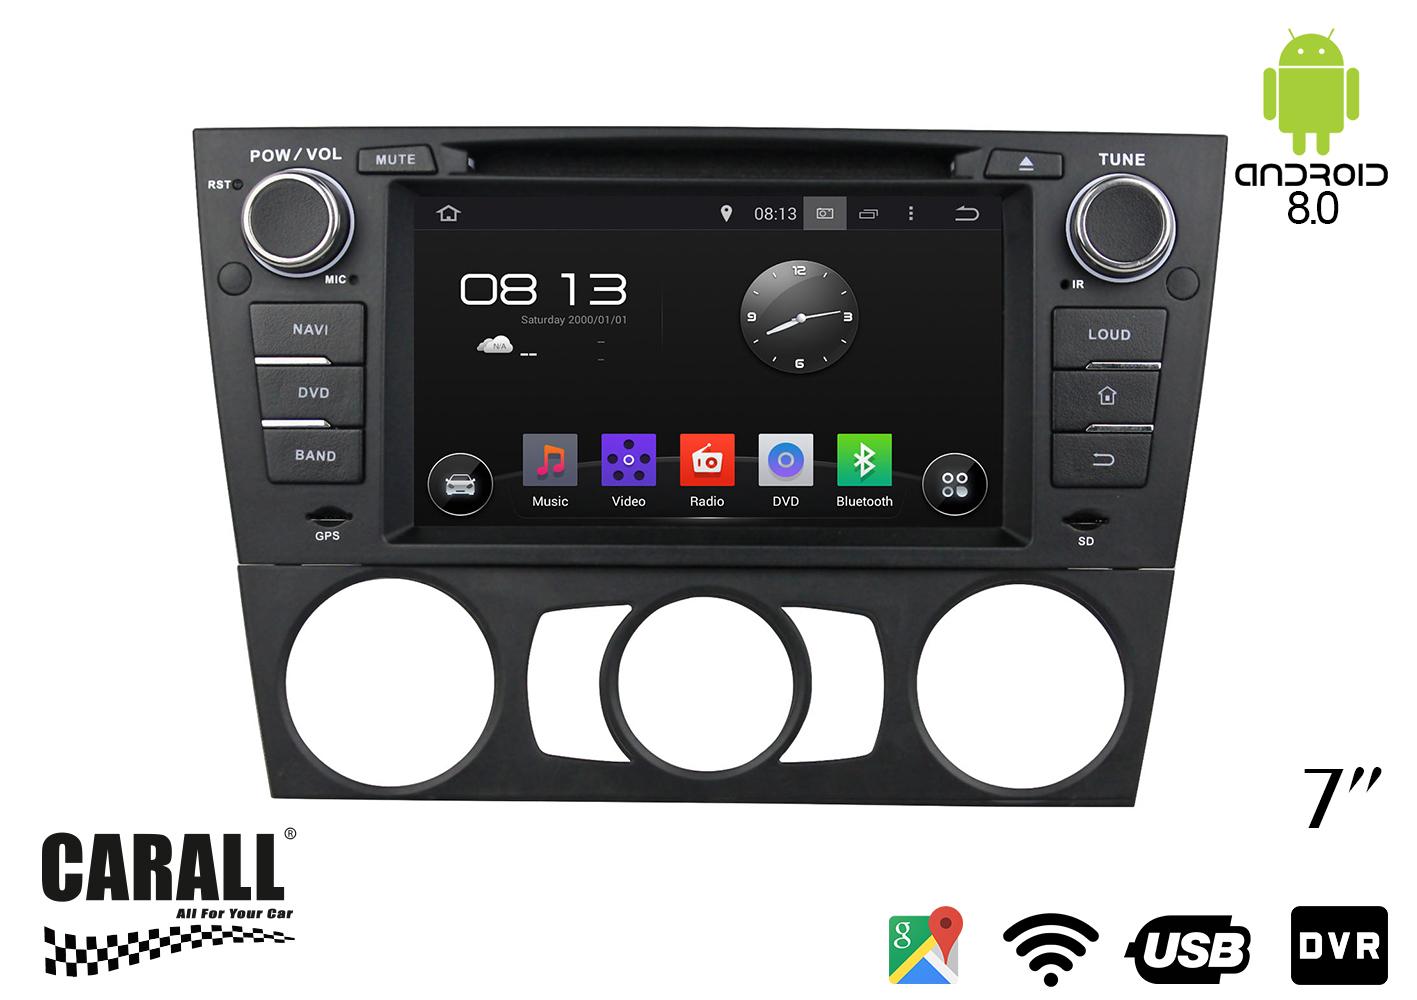 Autoradio Android 8,0 BMW E90 GPS DVD USB SD WI-FI Bluetooth Navigatore - KIT